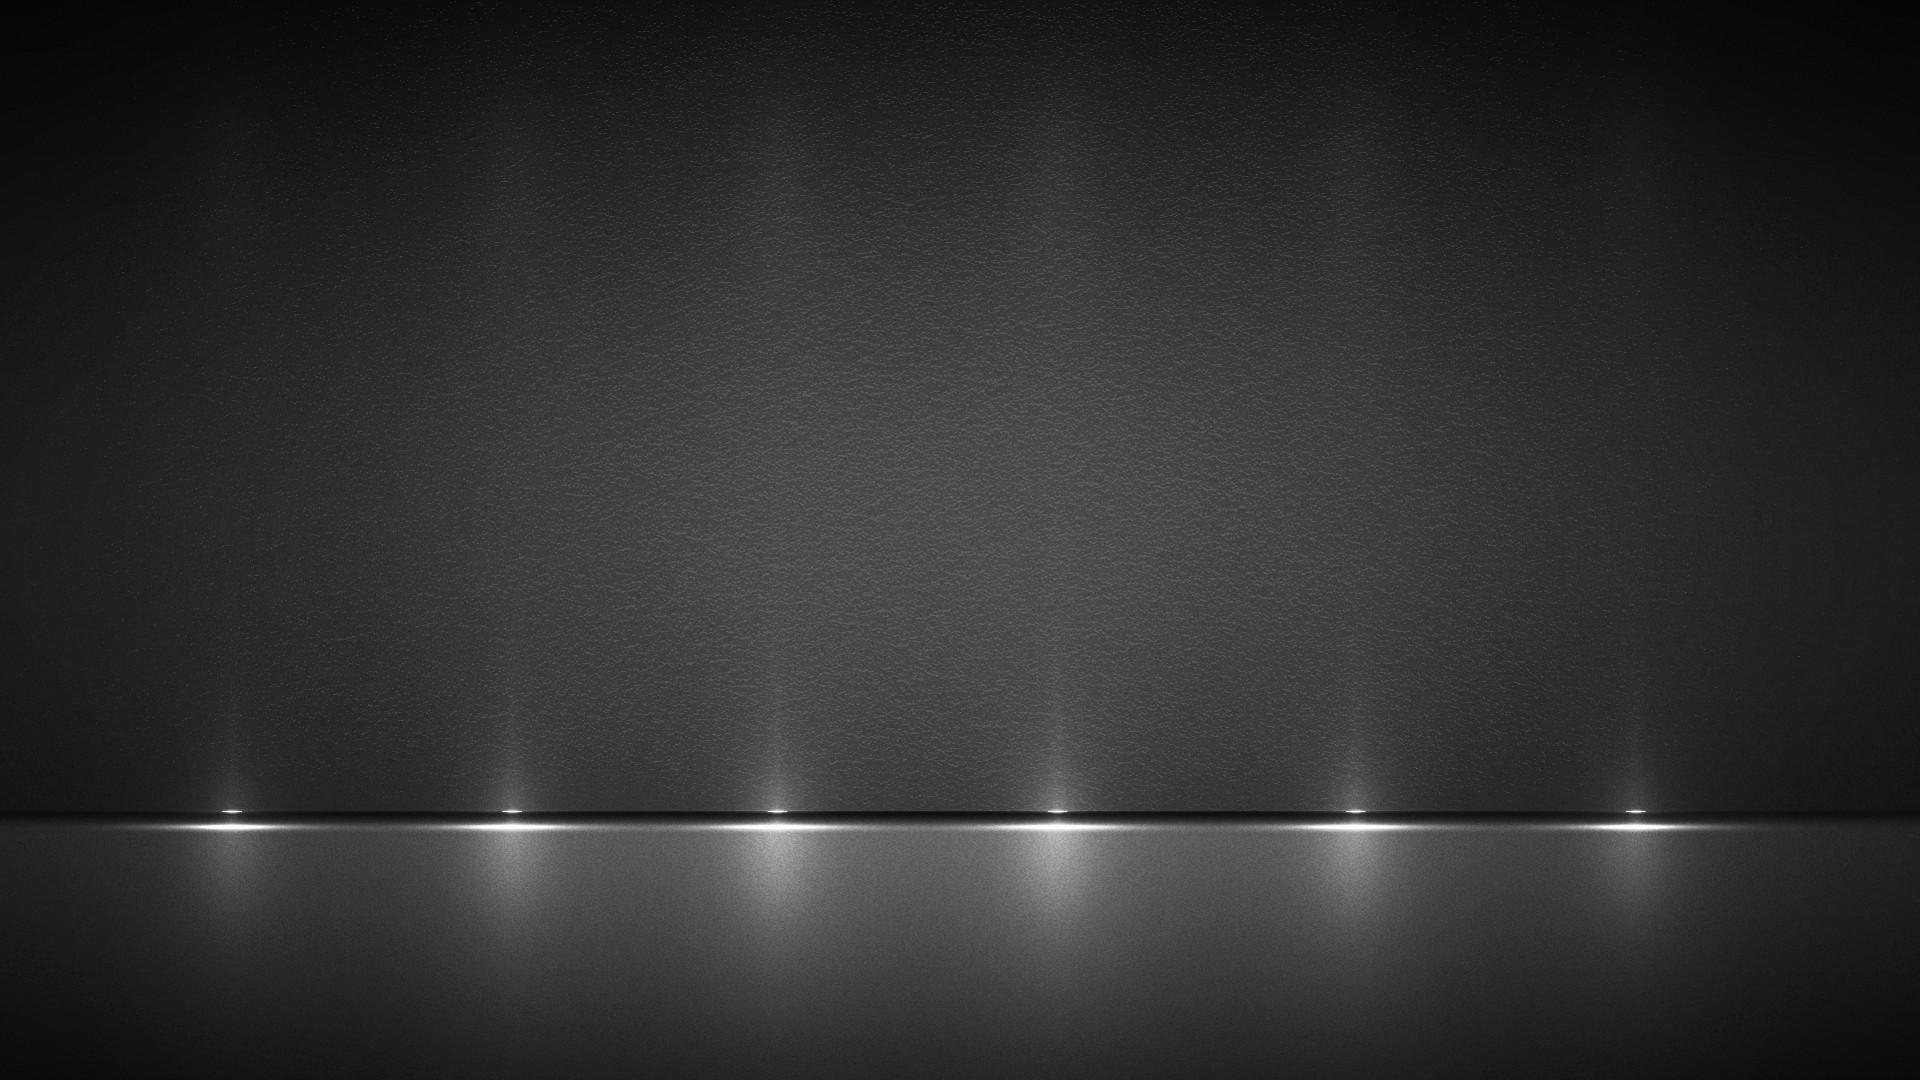 Black and White Powerpoint Template New Elegant Grey Illumination Background Presentations